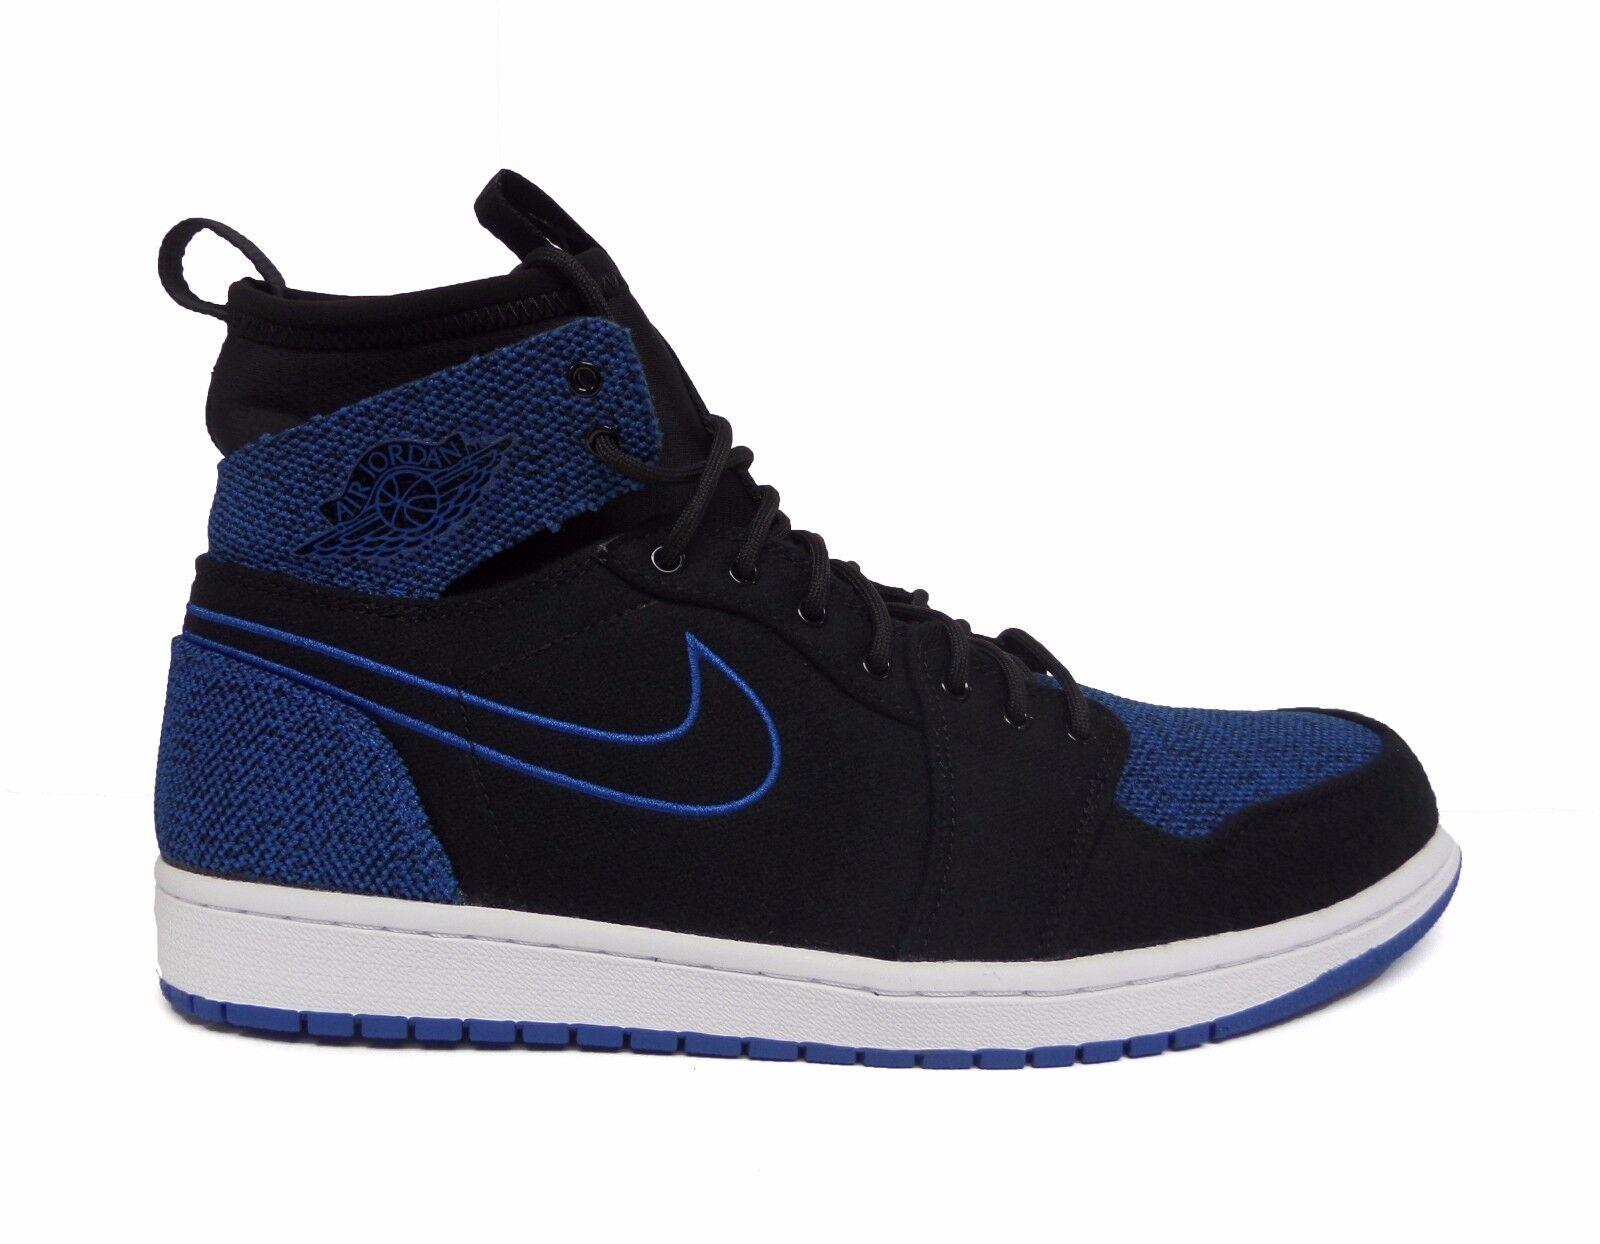 Nike Men's Air Jordan 1 RETRO ULTRA HIGH Shoes Black/Sport Royal 844700-007 a Special limited time